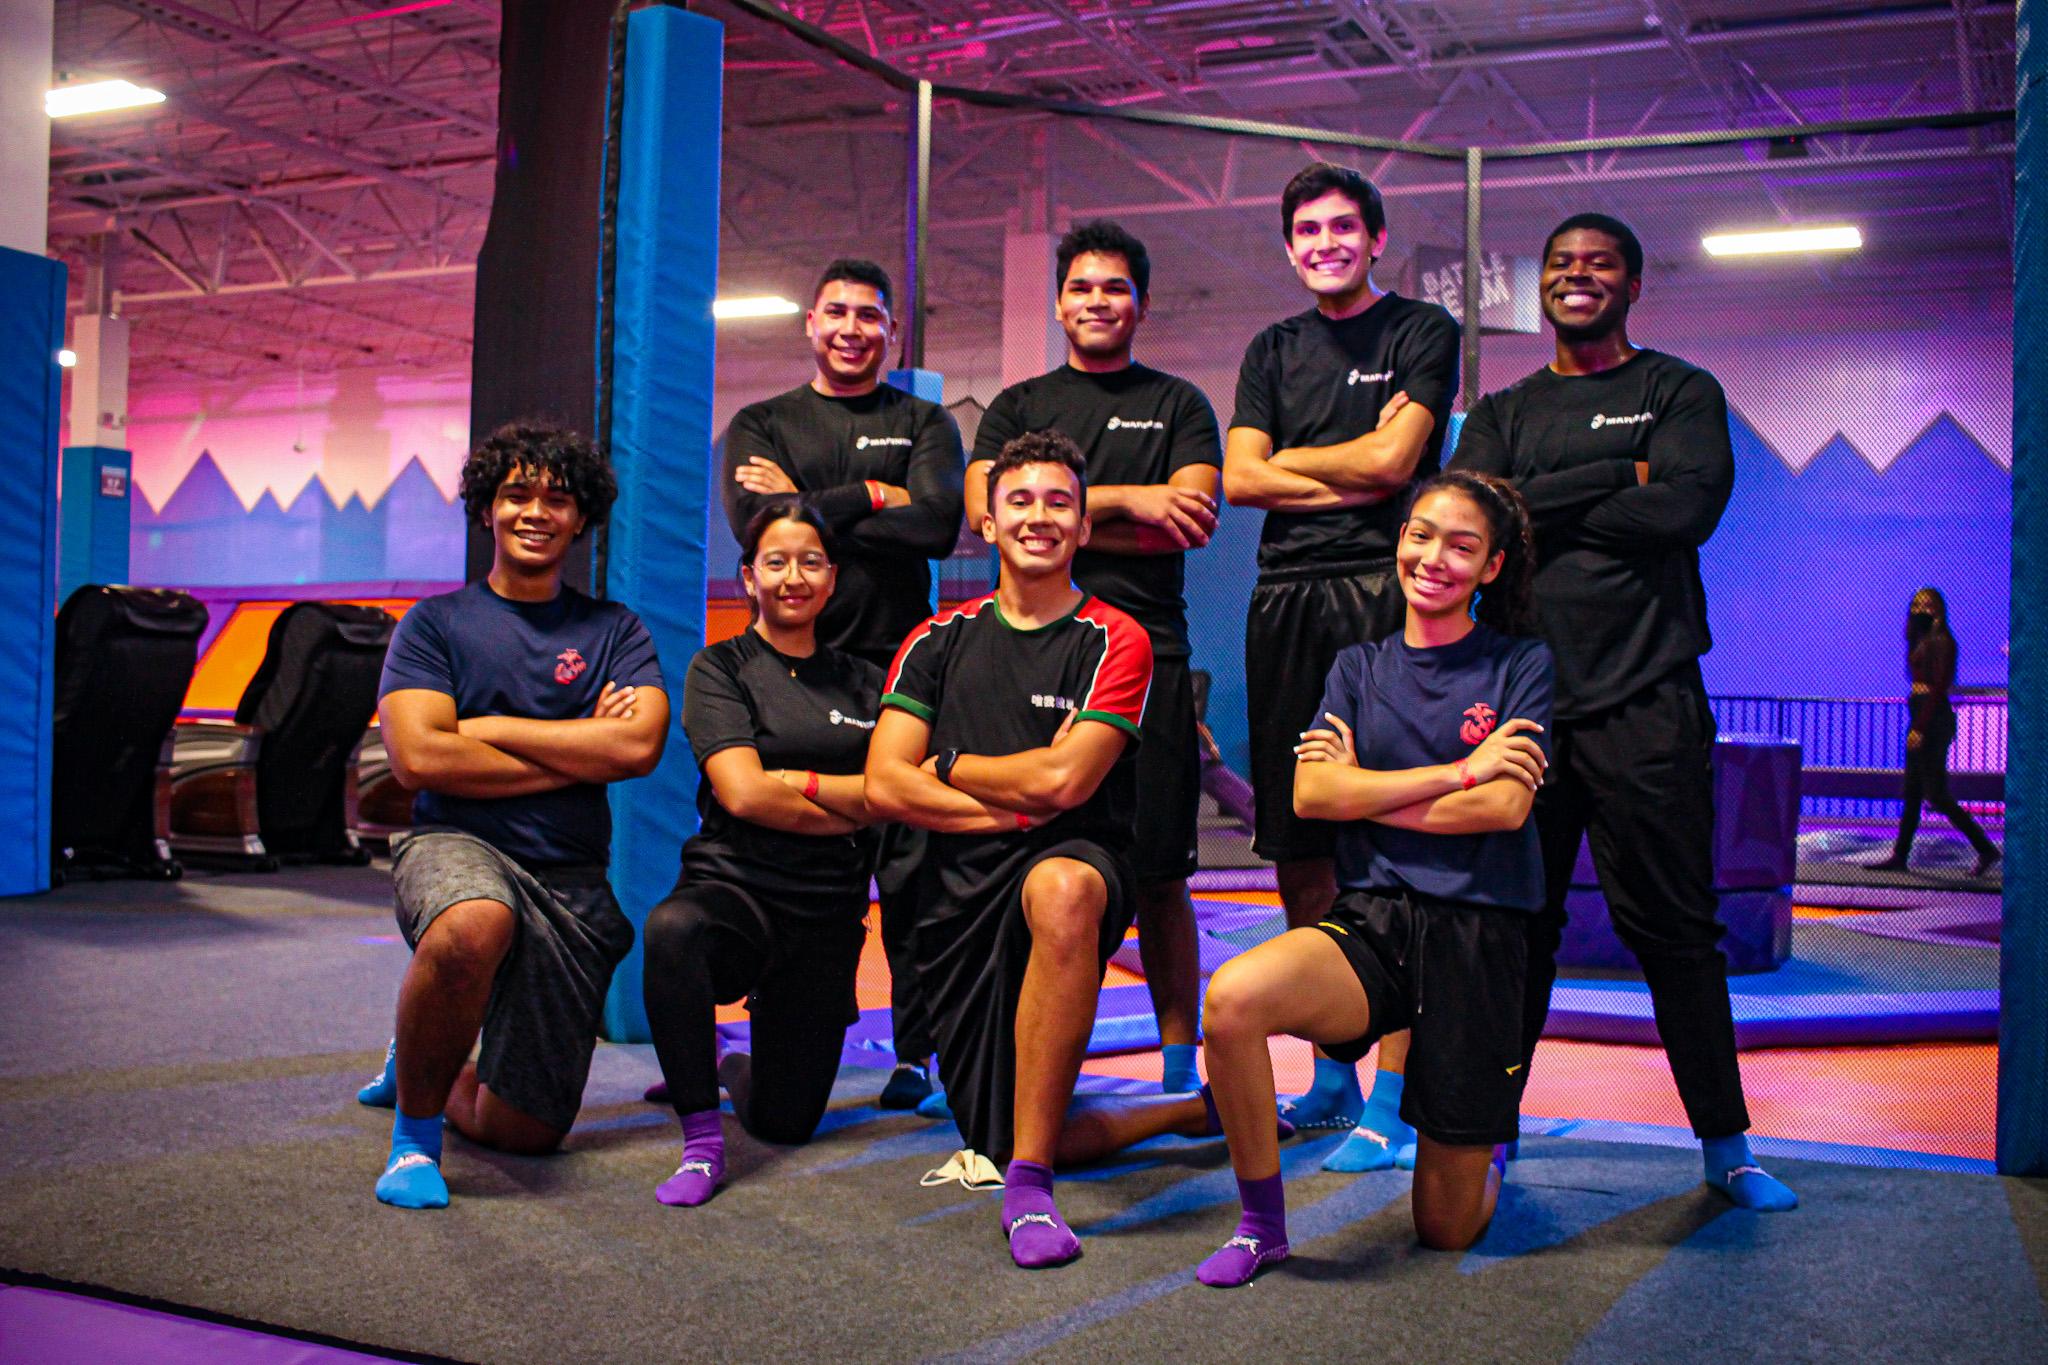 teambuilding at Altitude Trampoline